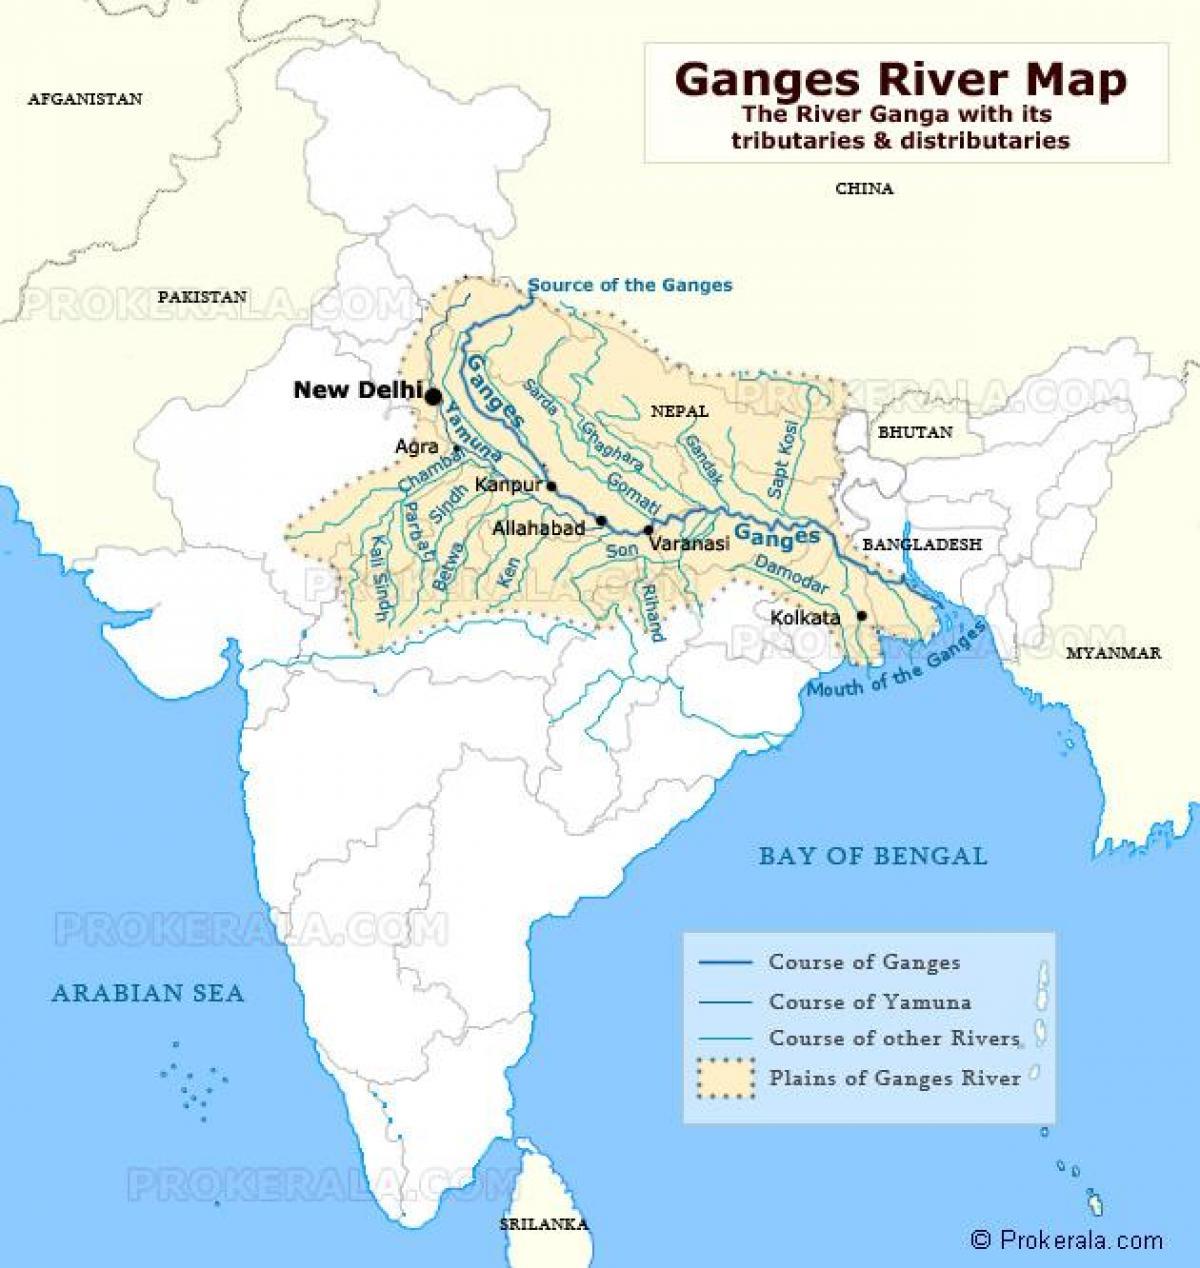 rio ganges mapa Rio ganges, na Índia, mapa   Índia rio ganges mapa (Sul da Ásia Ásia) rio ganges mapa